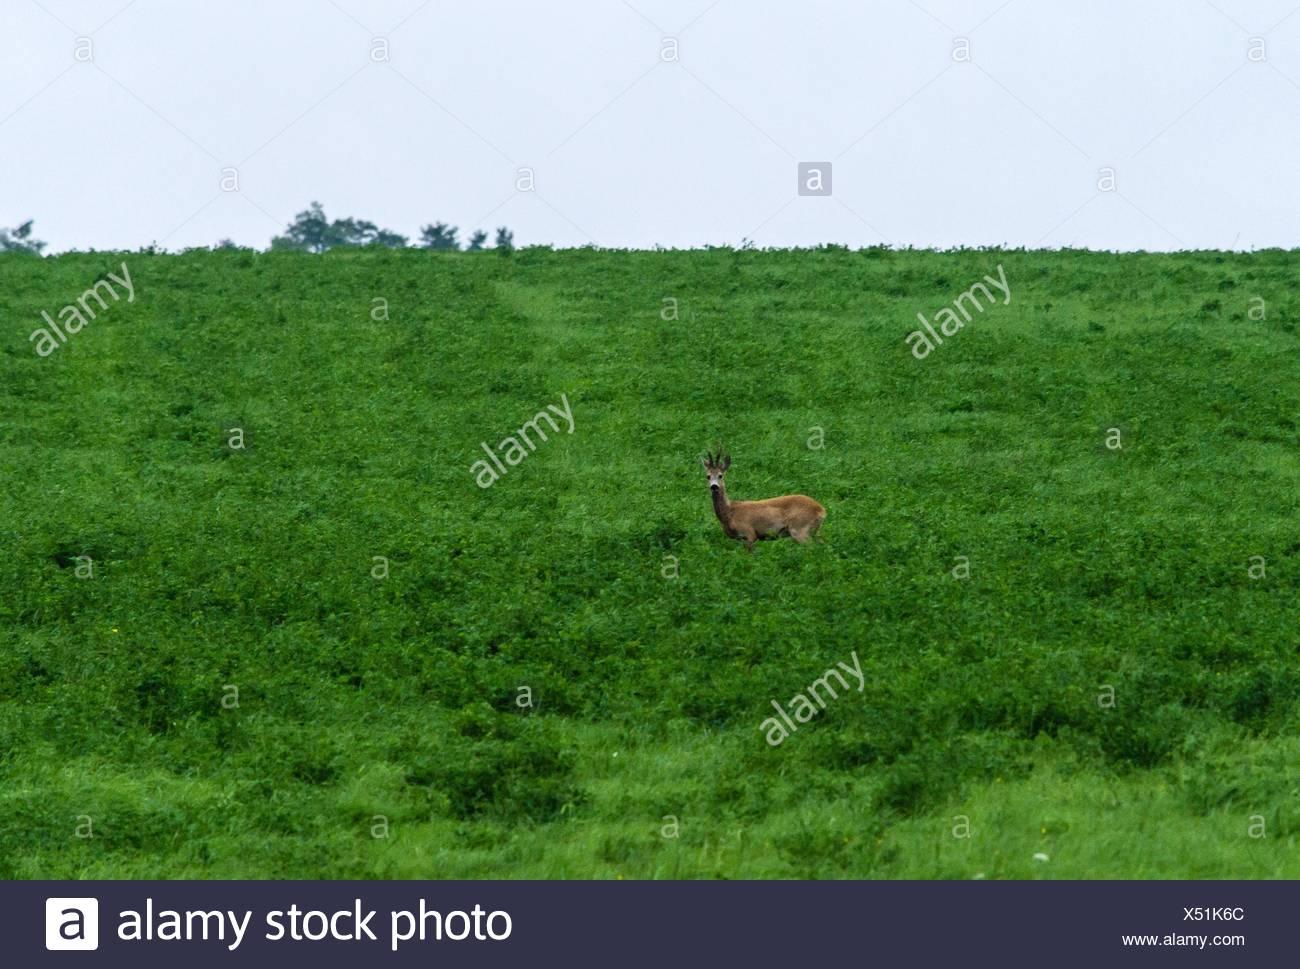 Shy deer - Stock Image